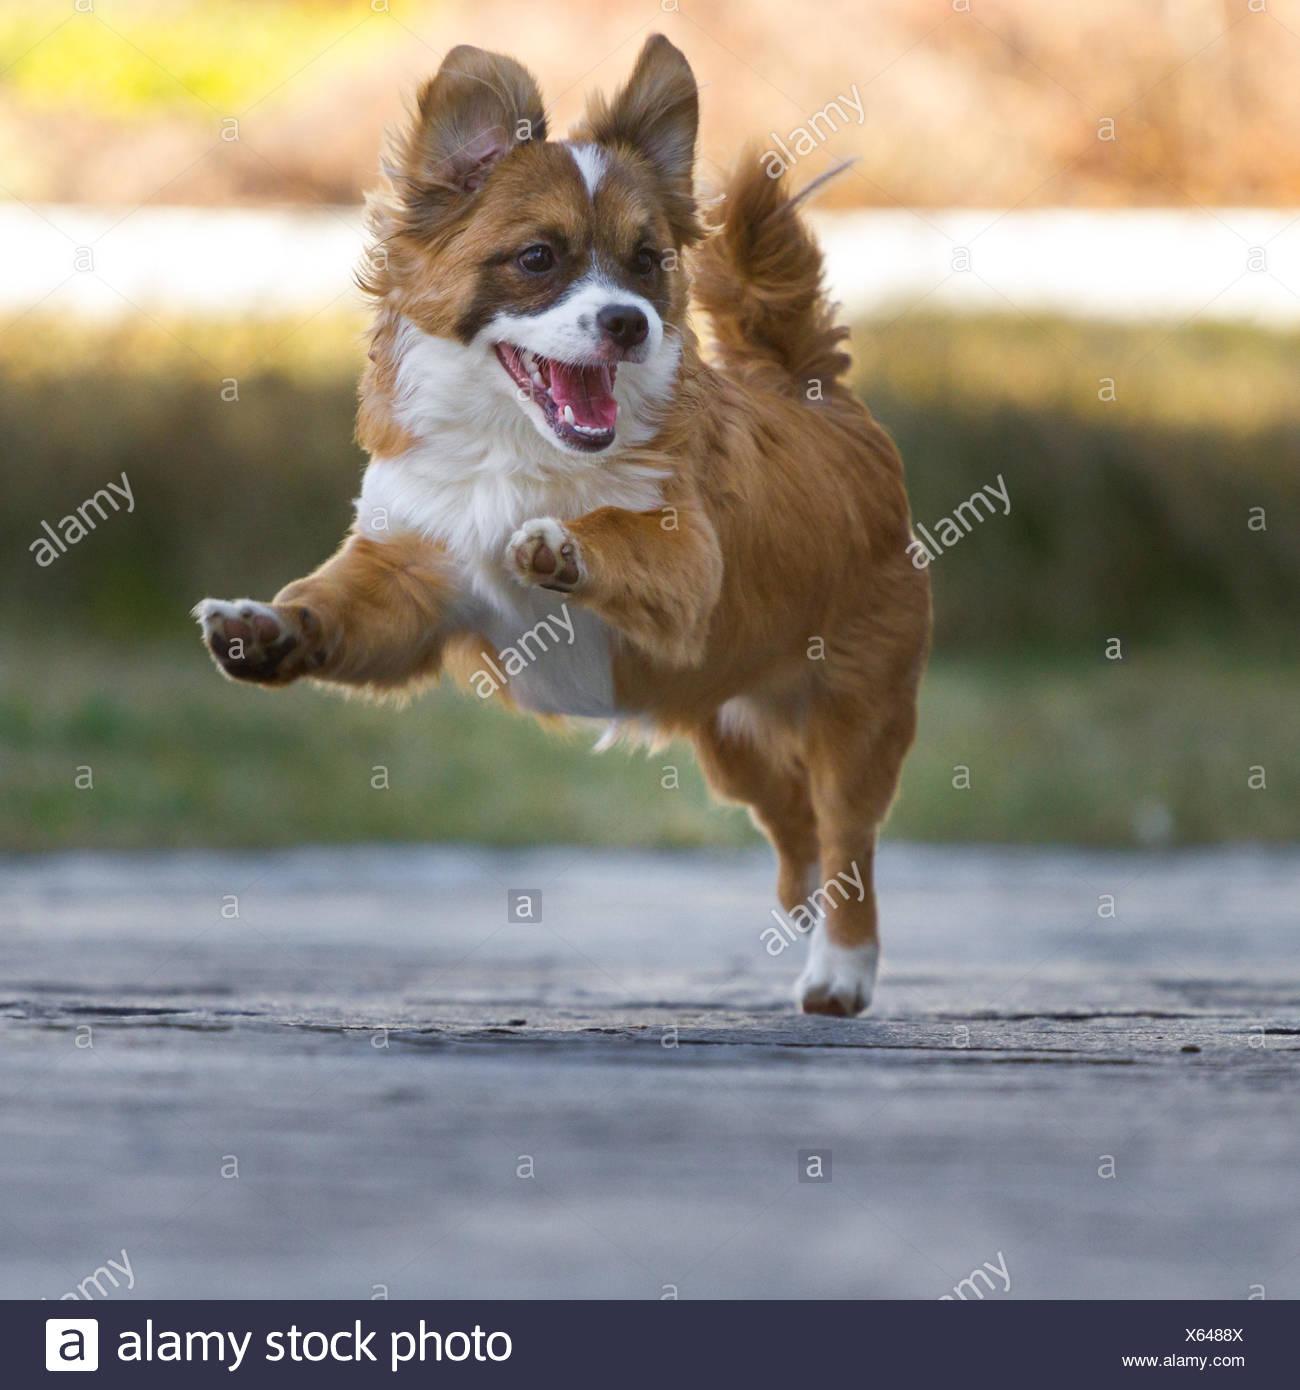 High-spirited Little Guy Stock Photo